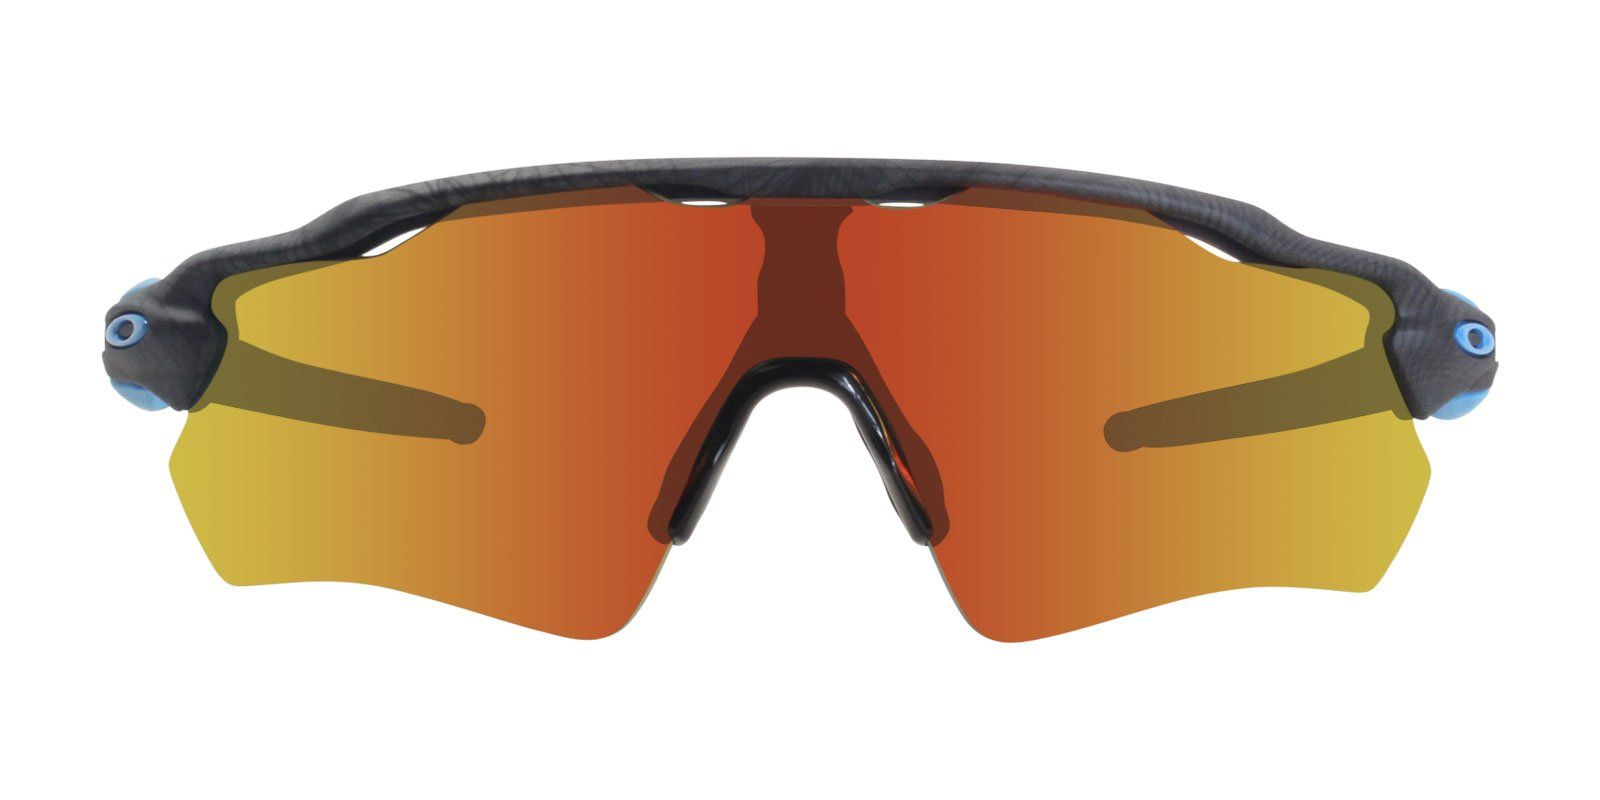 8a957e54097 Oakley Radar Ev Path Gray   Red Lens Mirror Sunglasses